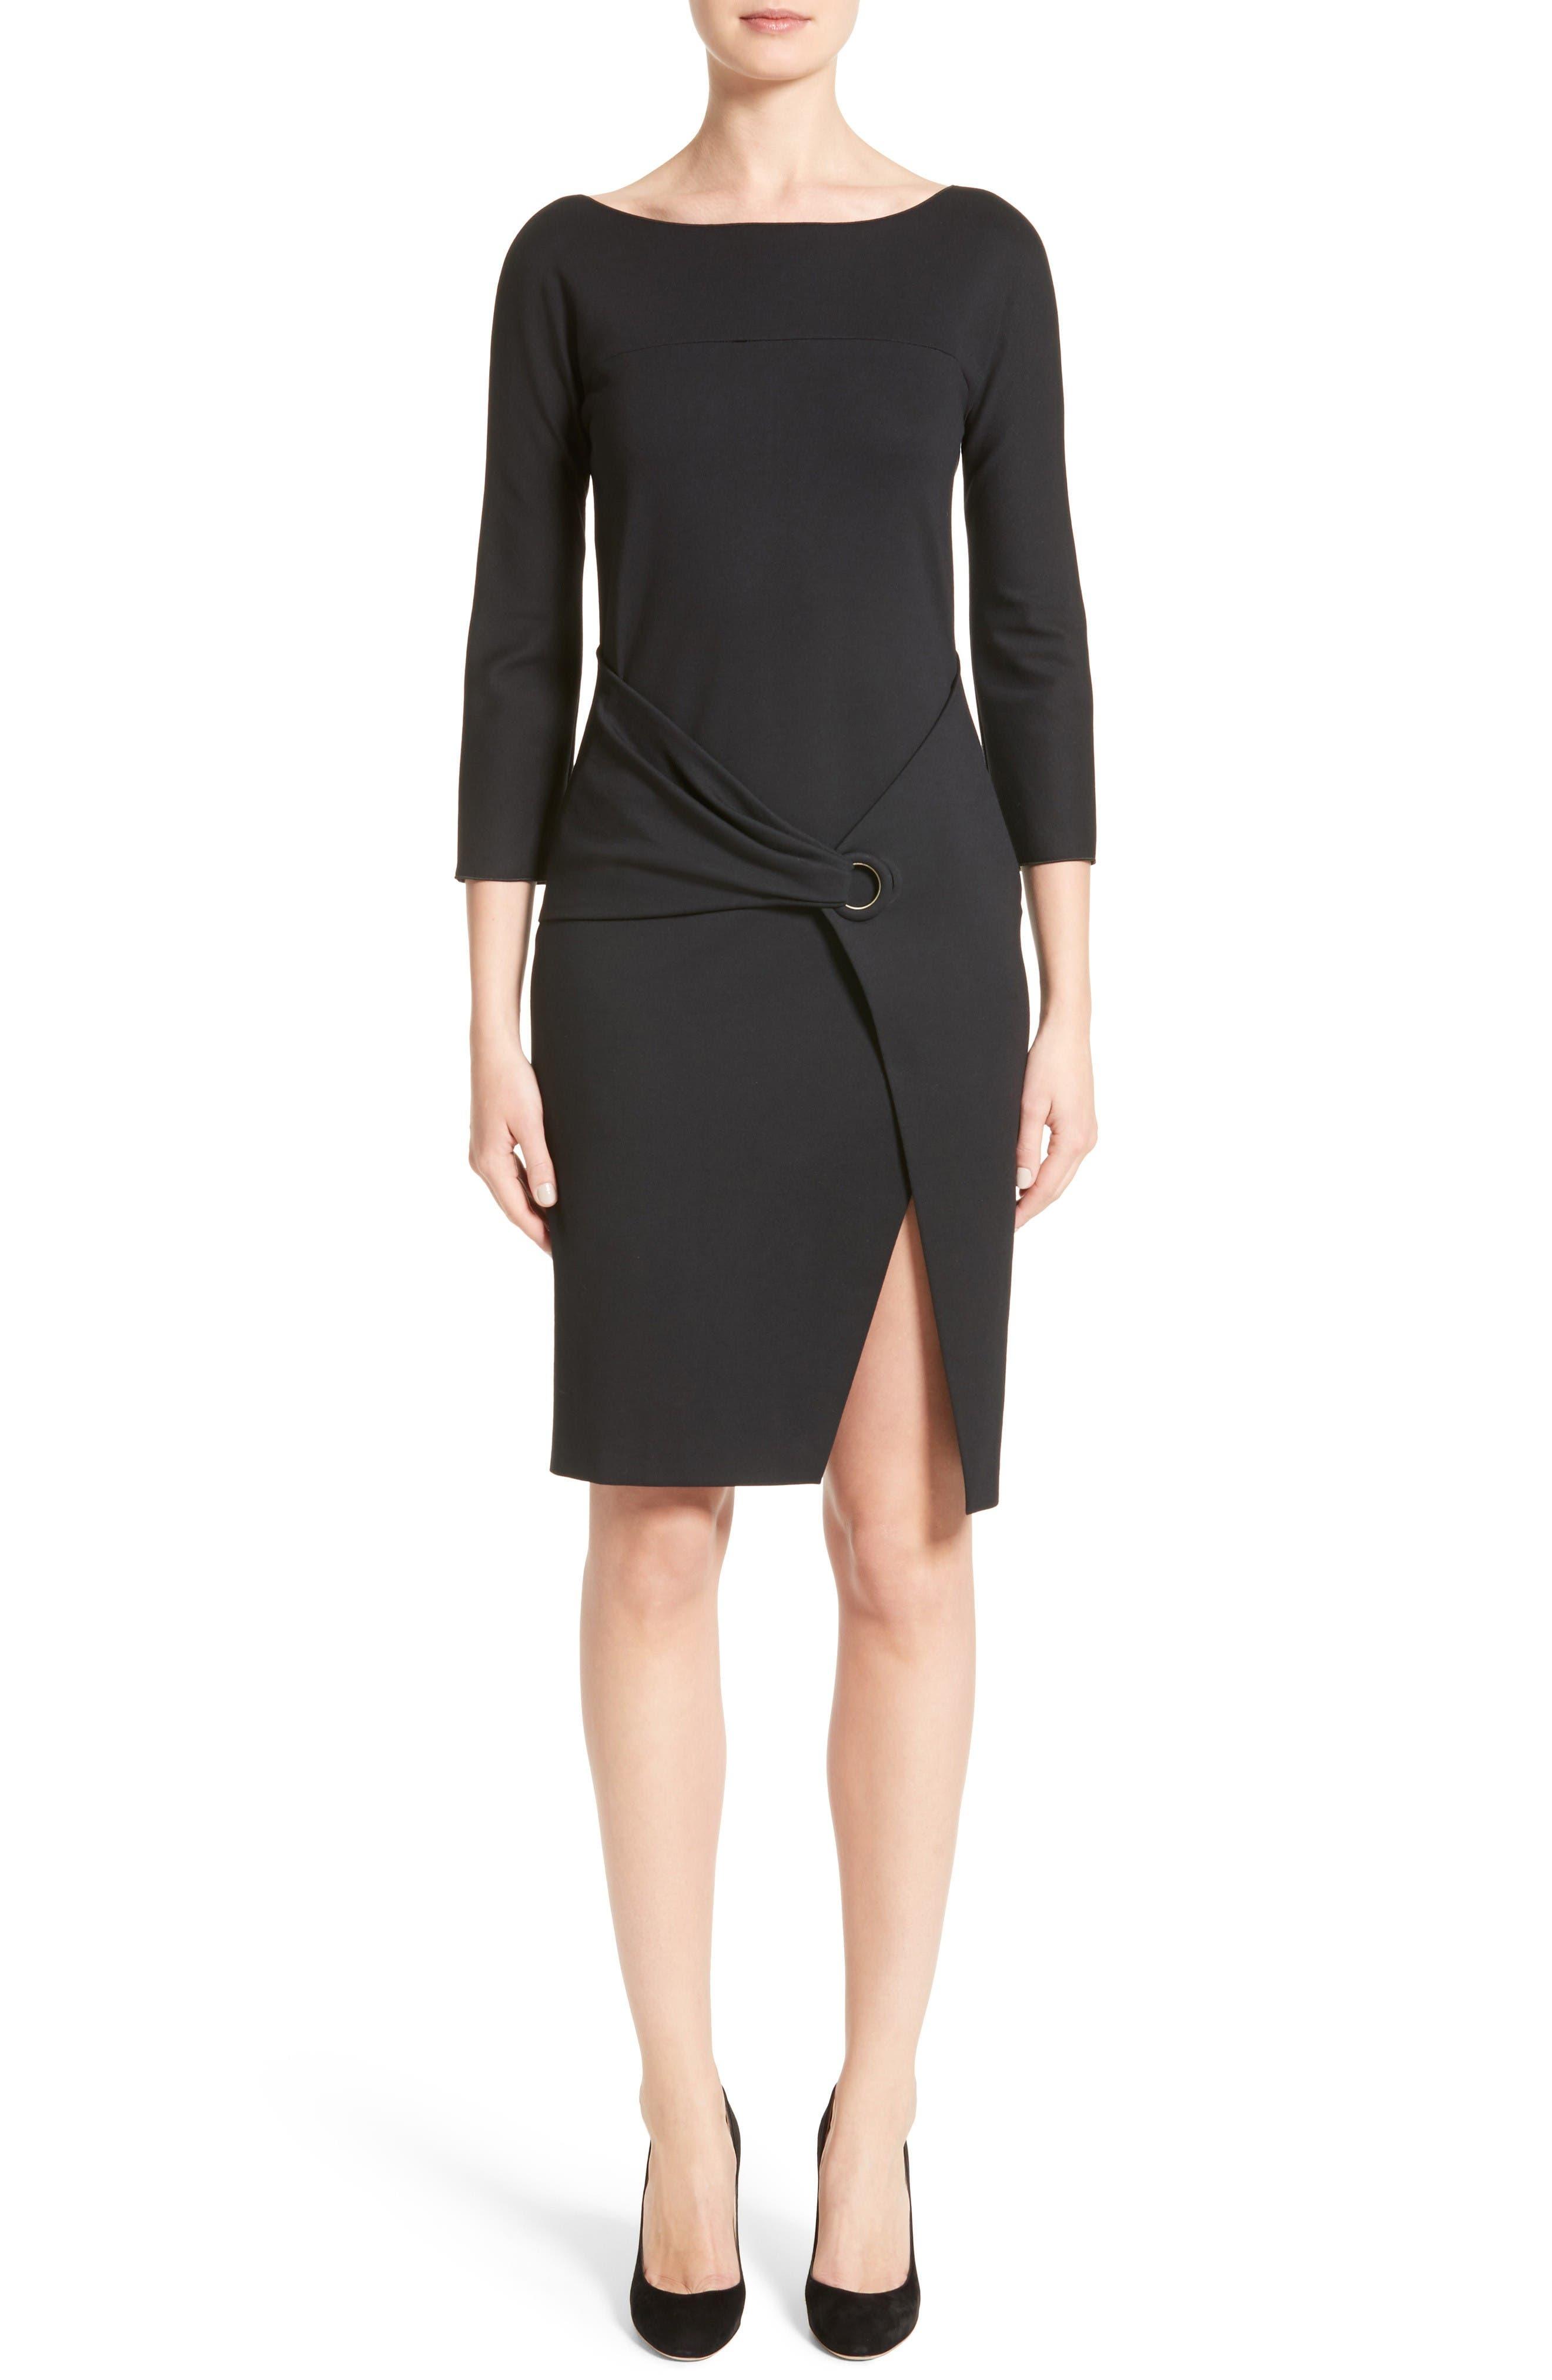 Alternate Image 1 Selected - Armani Collezioni Grommet Detail Milano Jersey Dress